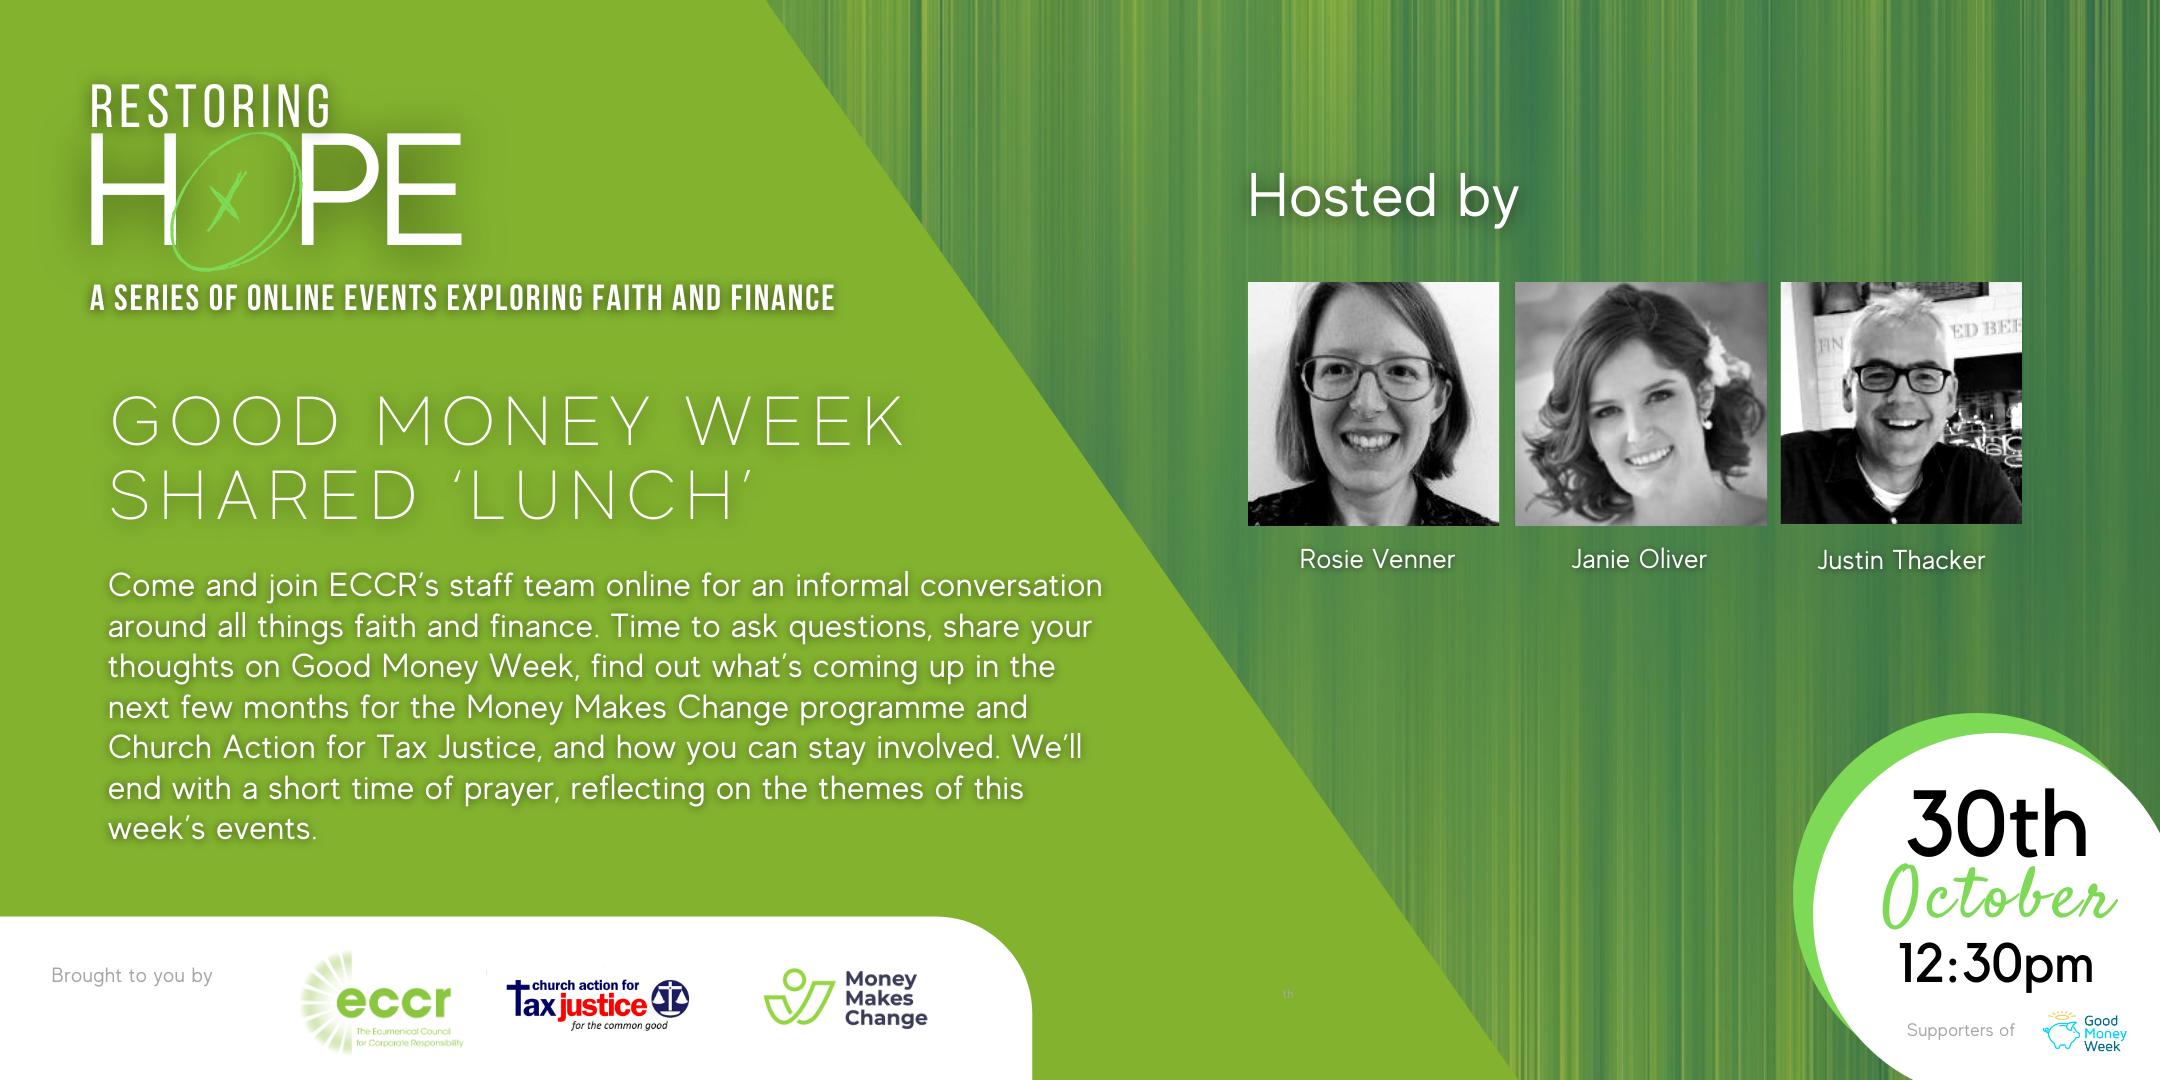 Restoring Hope | Good Money Week 'shared' lunch